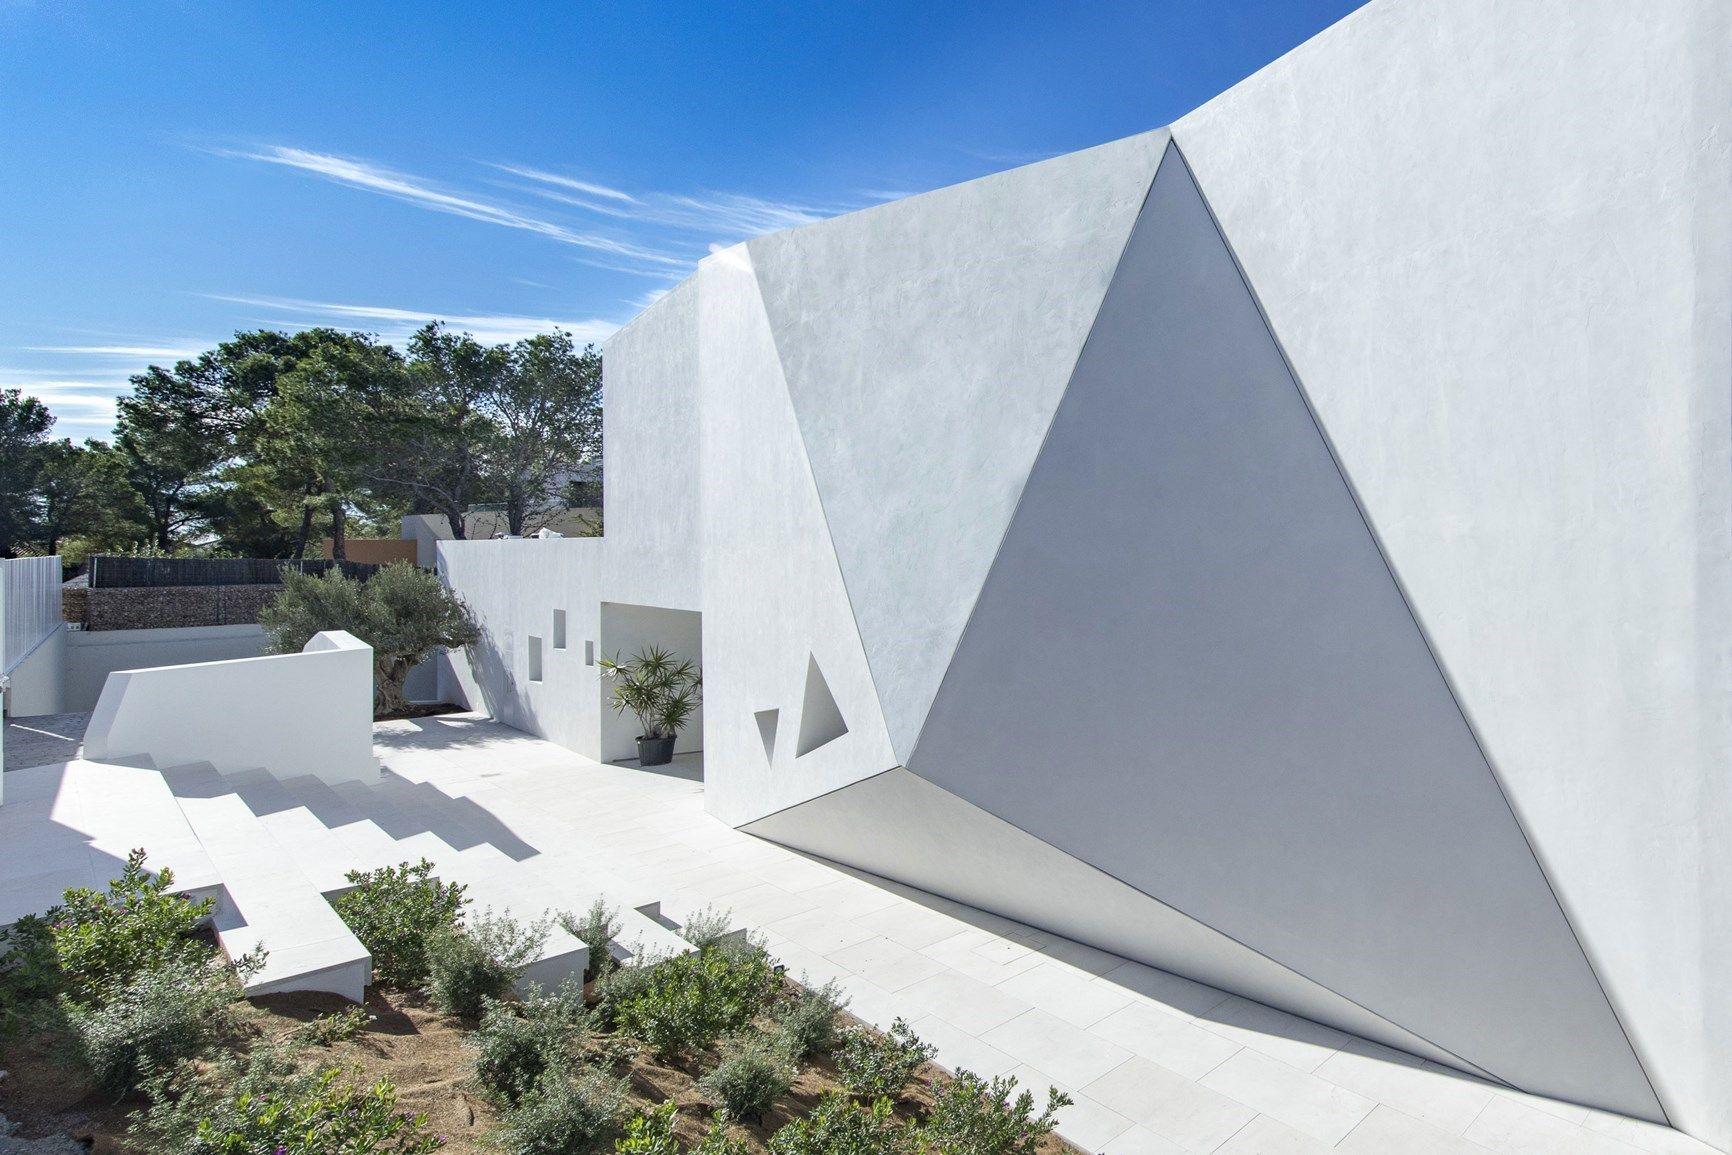 Ekinex per Villa Triángulo